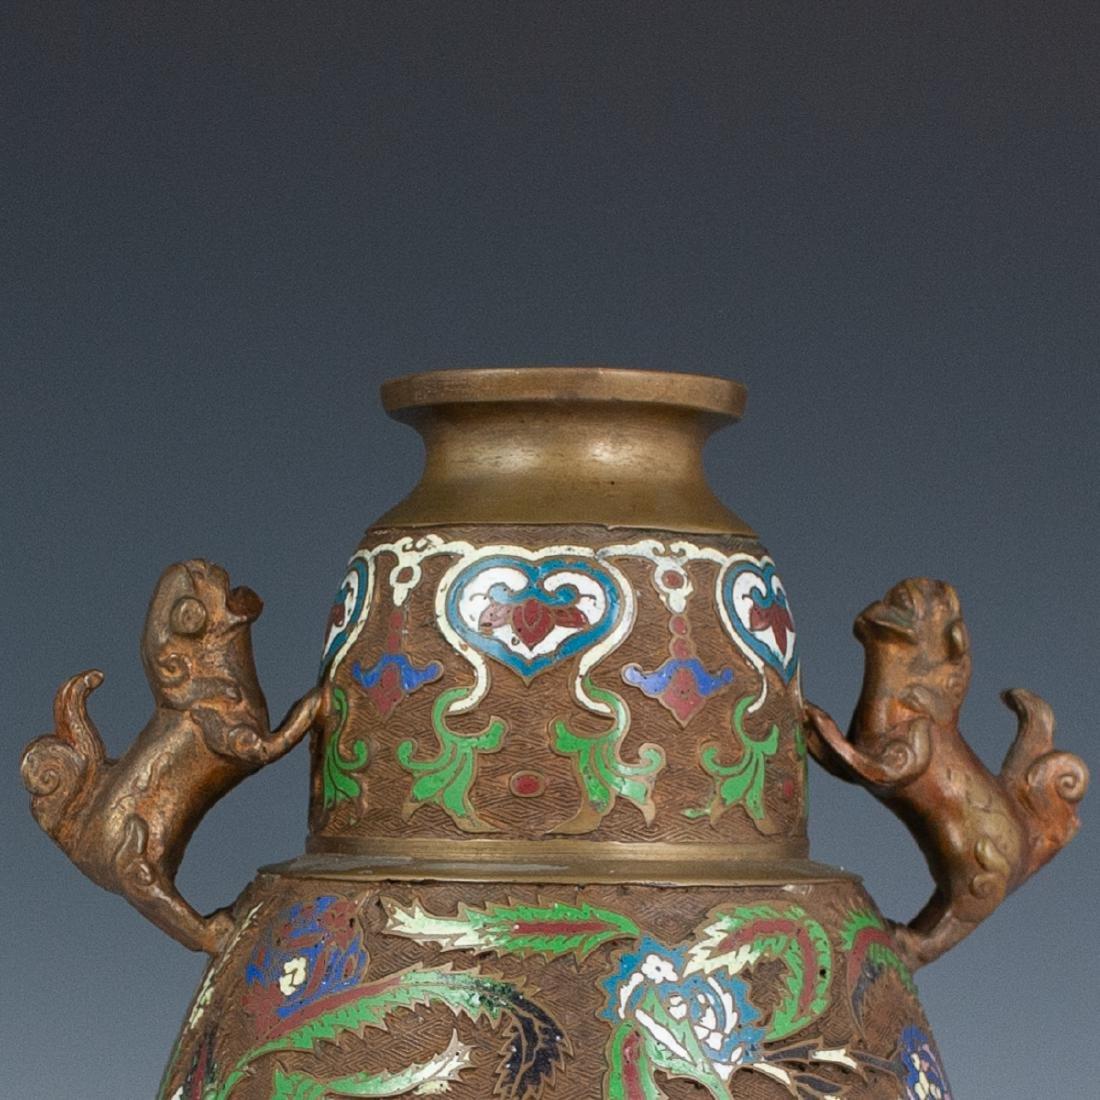 Japanese Enameled Cloisonne Bronze Vase - 2